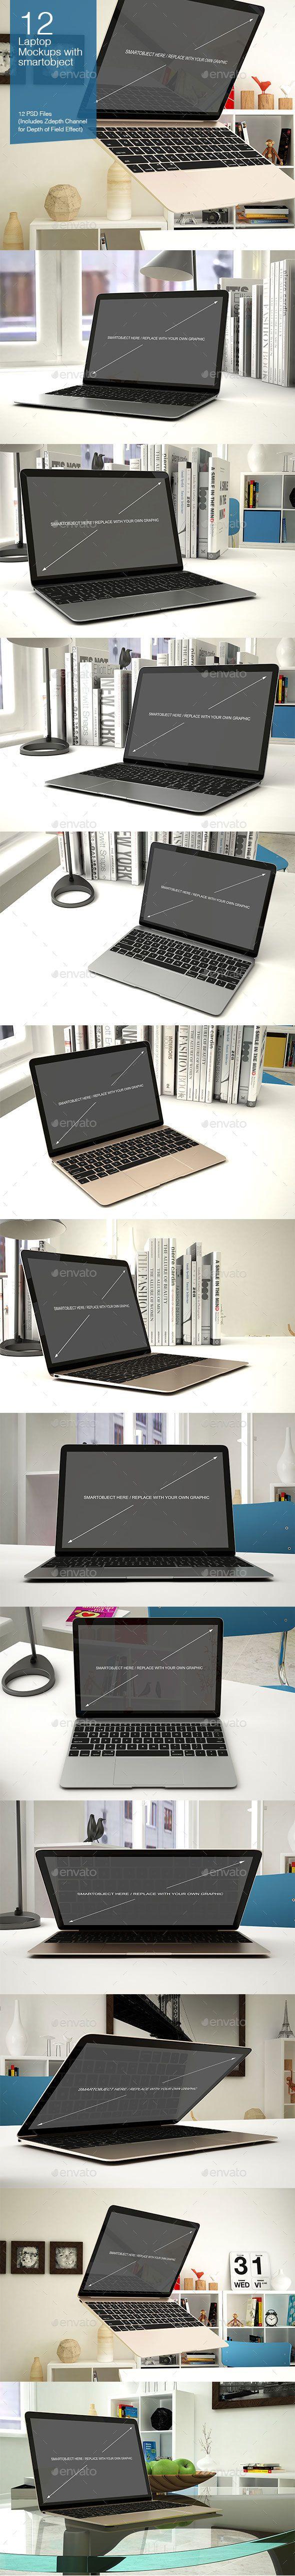 Laptop Mockup 12 Poses #design Download: http://graphicriver.net/item/laptop-mockup-12-poses/13389840?ref=ksioks